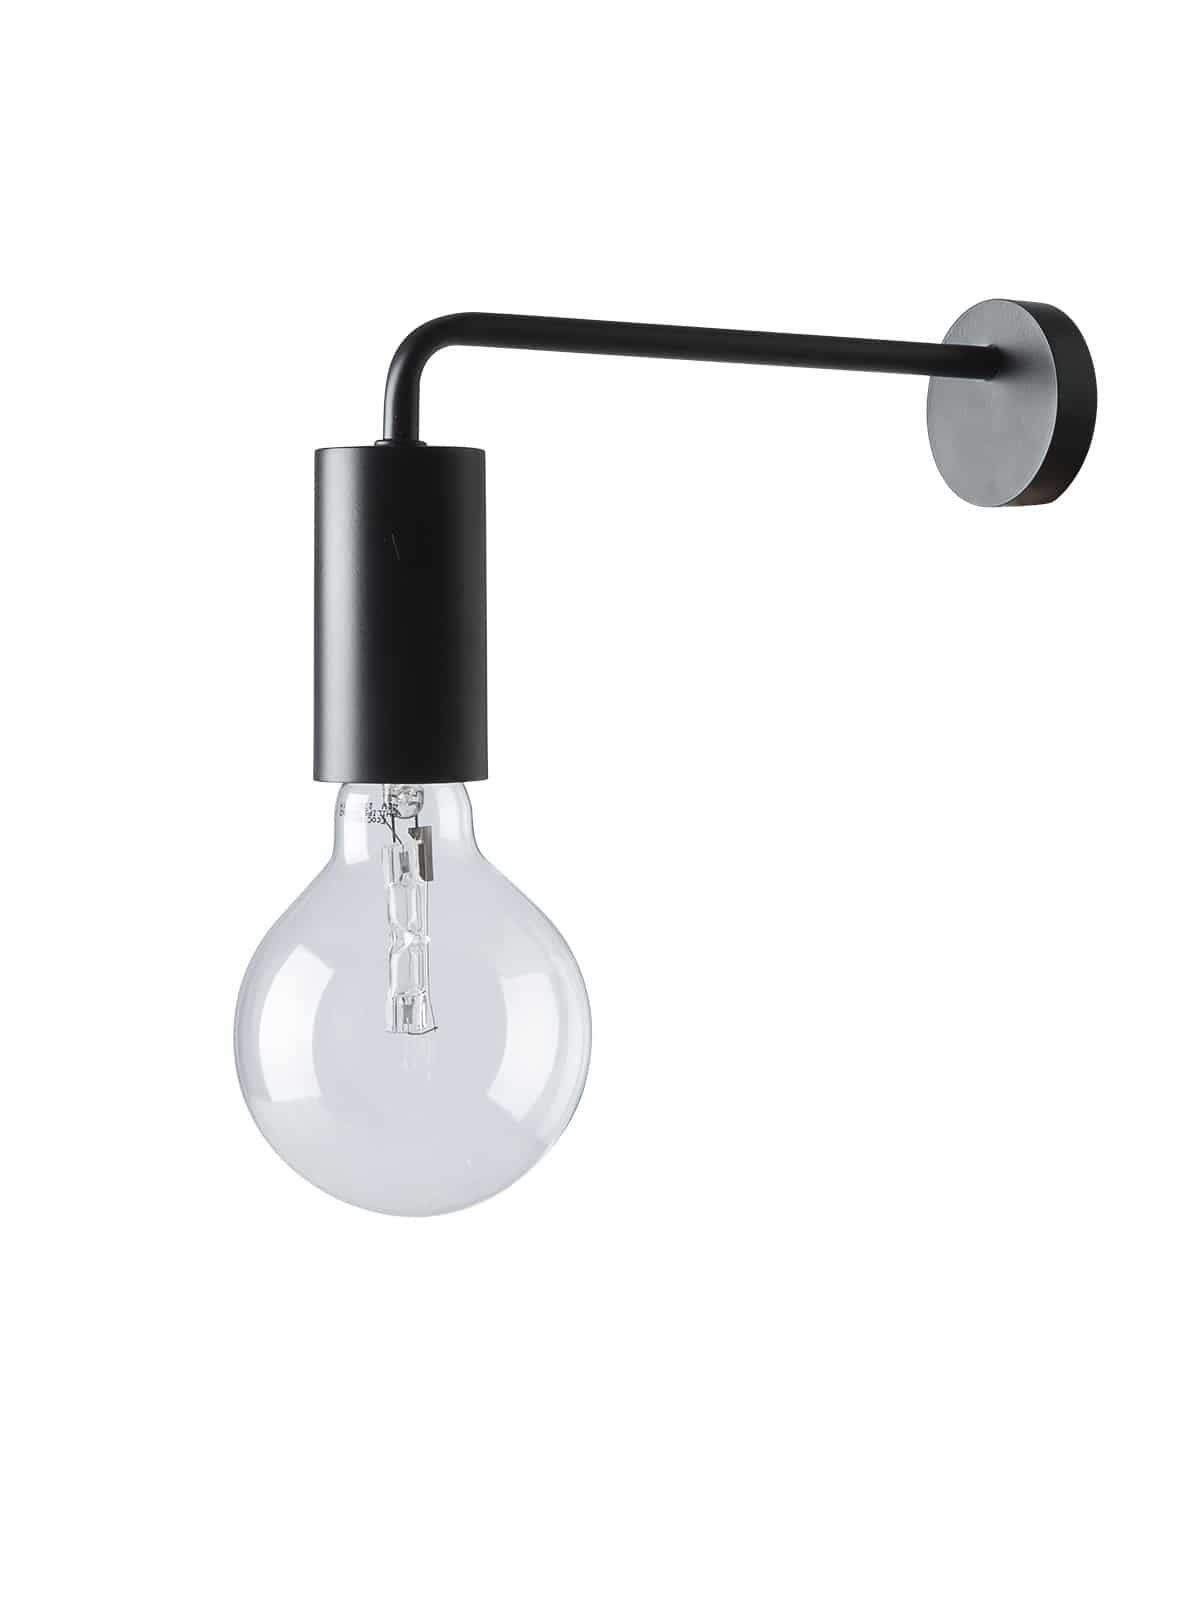 Wandleuchten archive lampen leuchten designerleuchten online wandleuchten archive lampen leuchten designerleuchten online berlin design parisarafo Choice Image